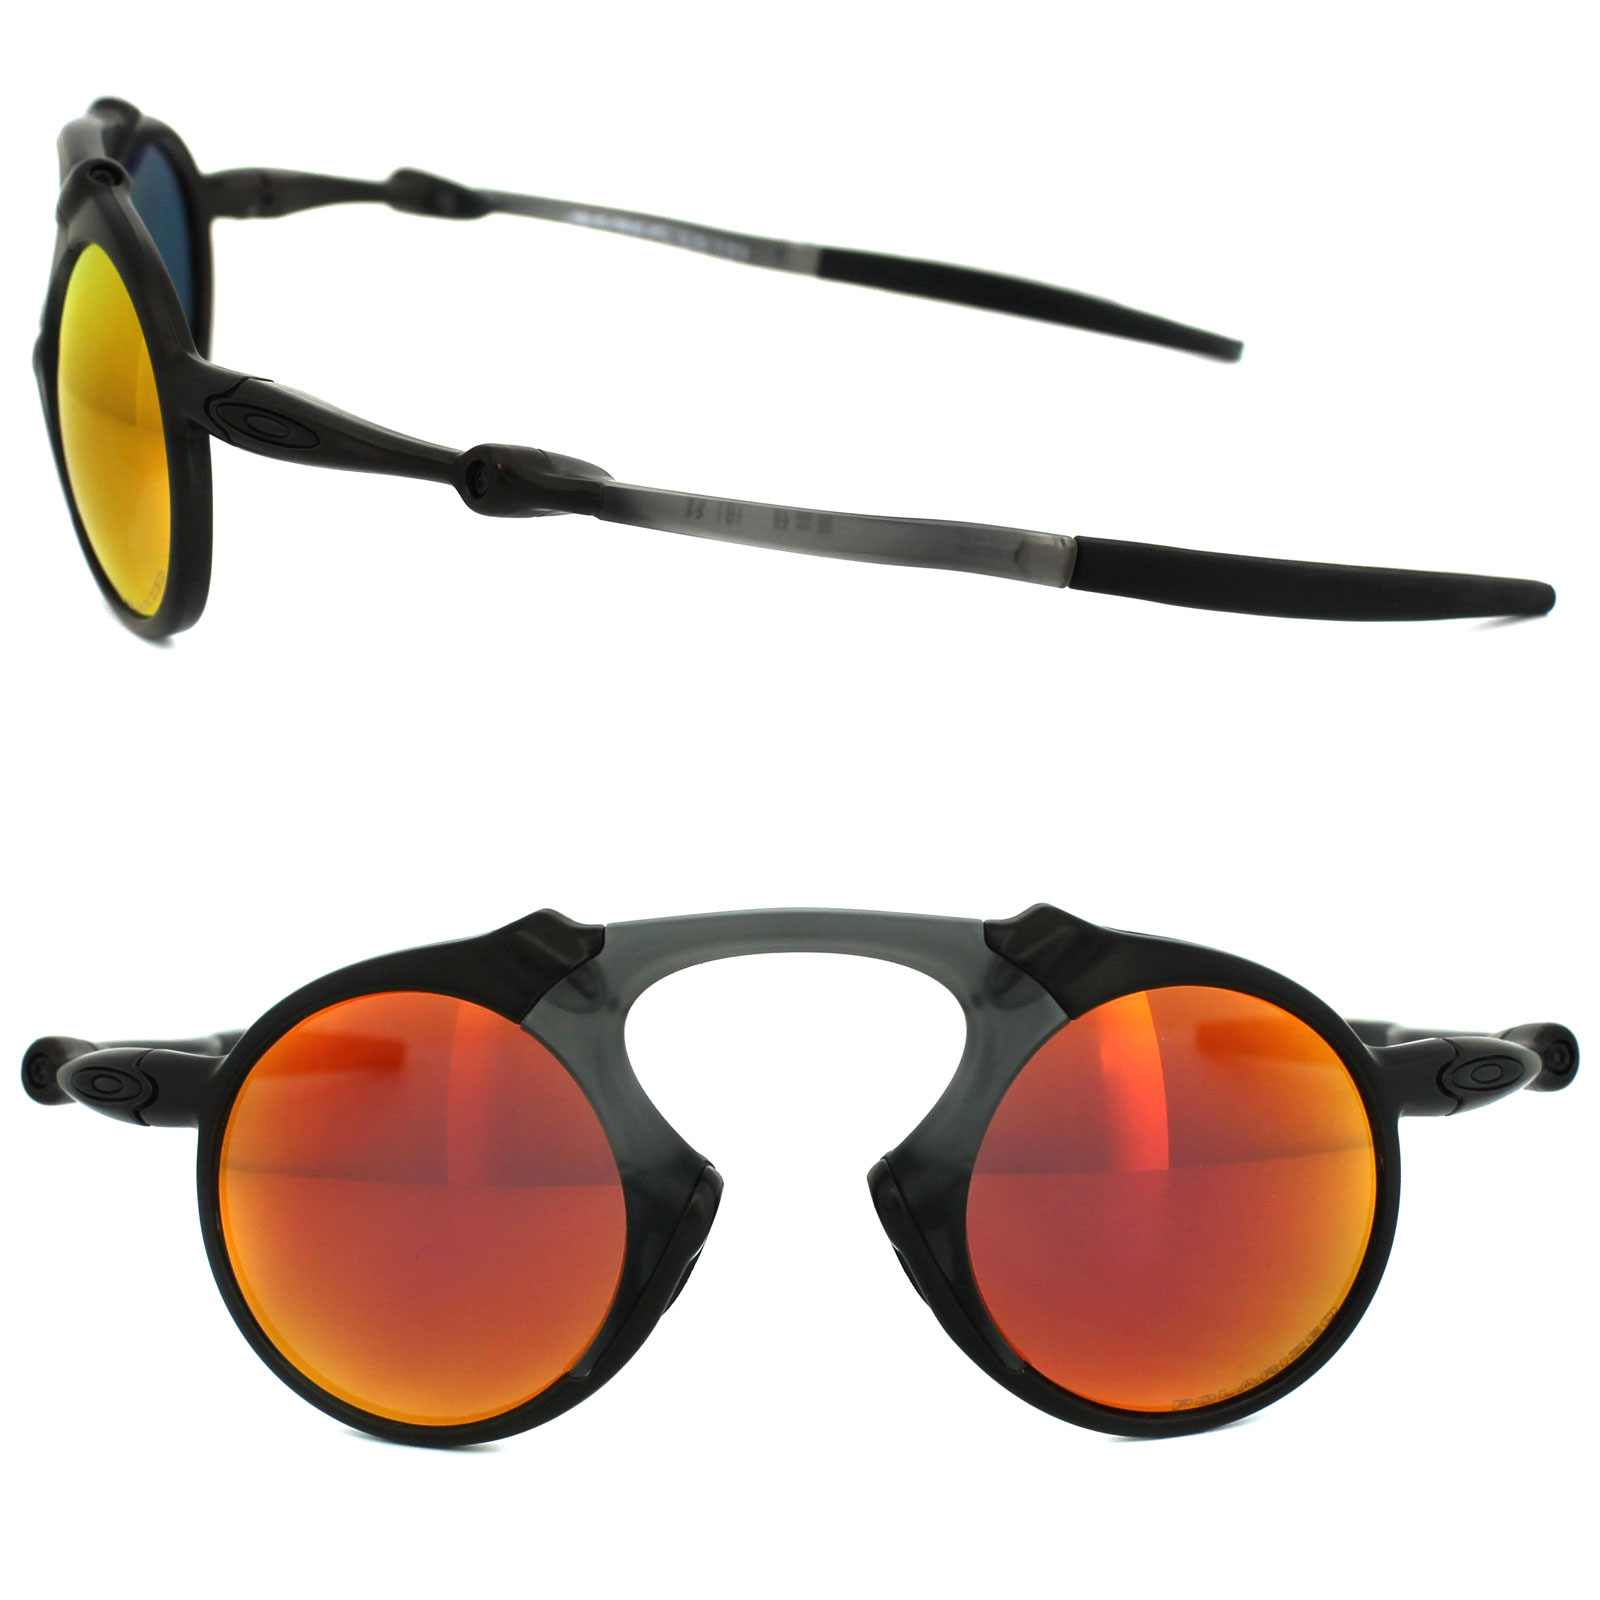 cc7bb6dd2e Sentinel Oakley Sunglasses Madman OO6019-04 Dark Carbon Ruby Iridium  Polarized